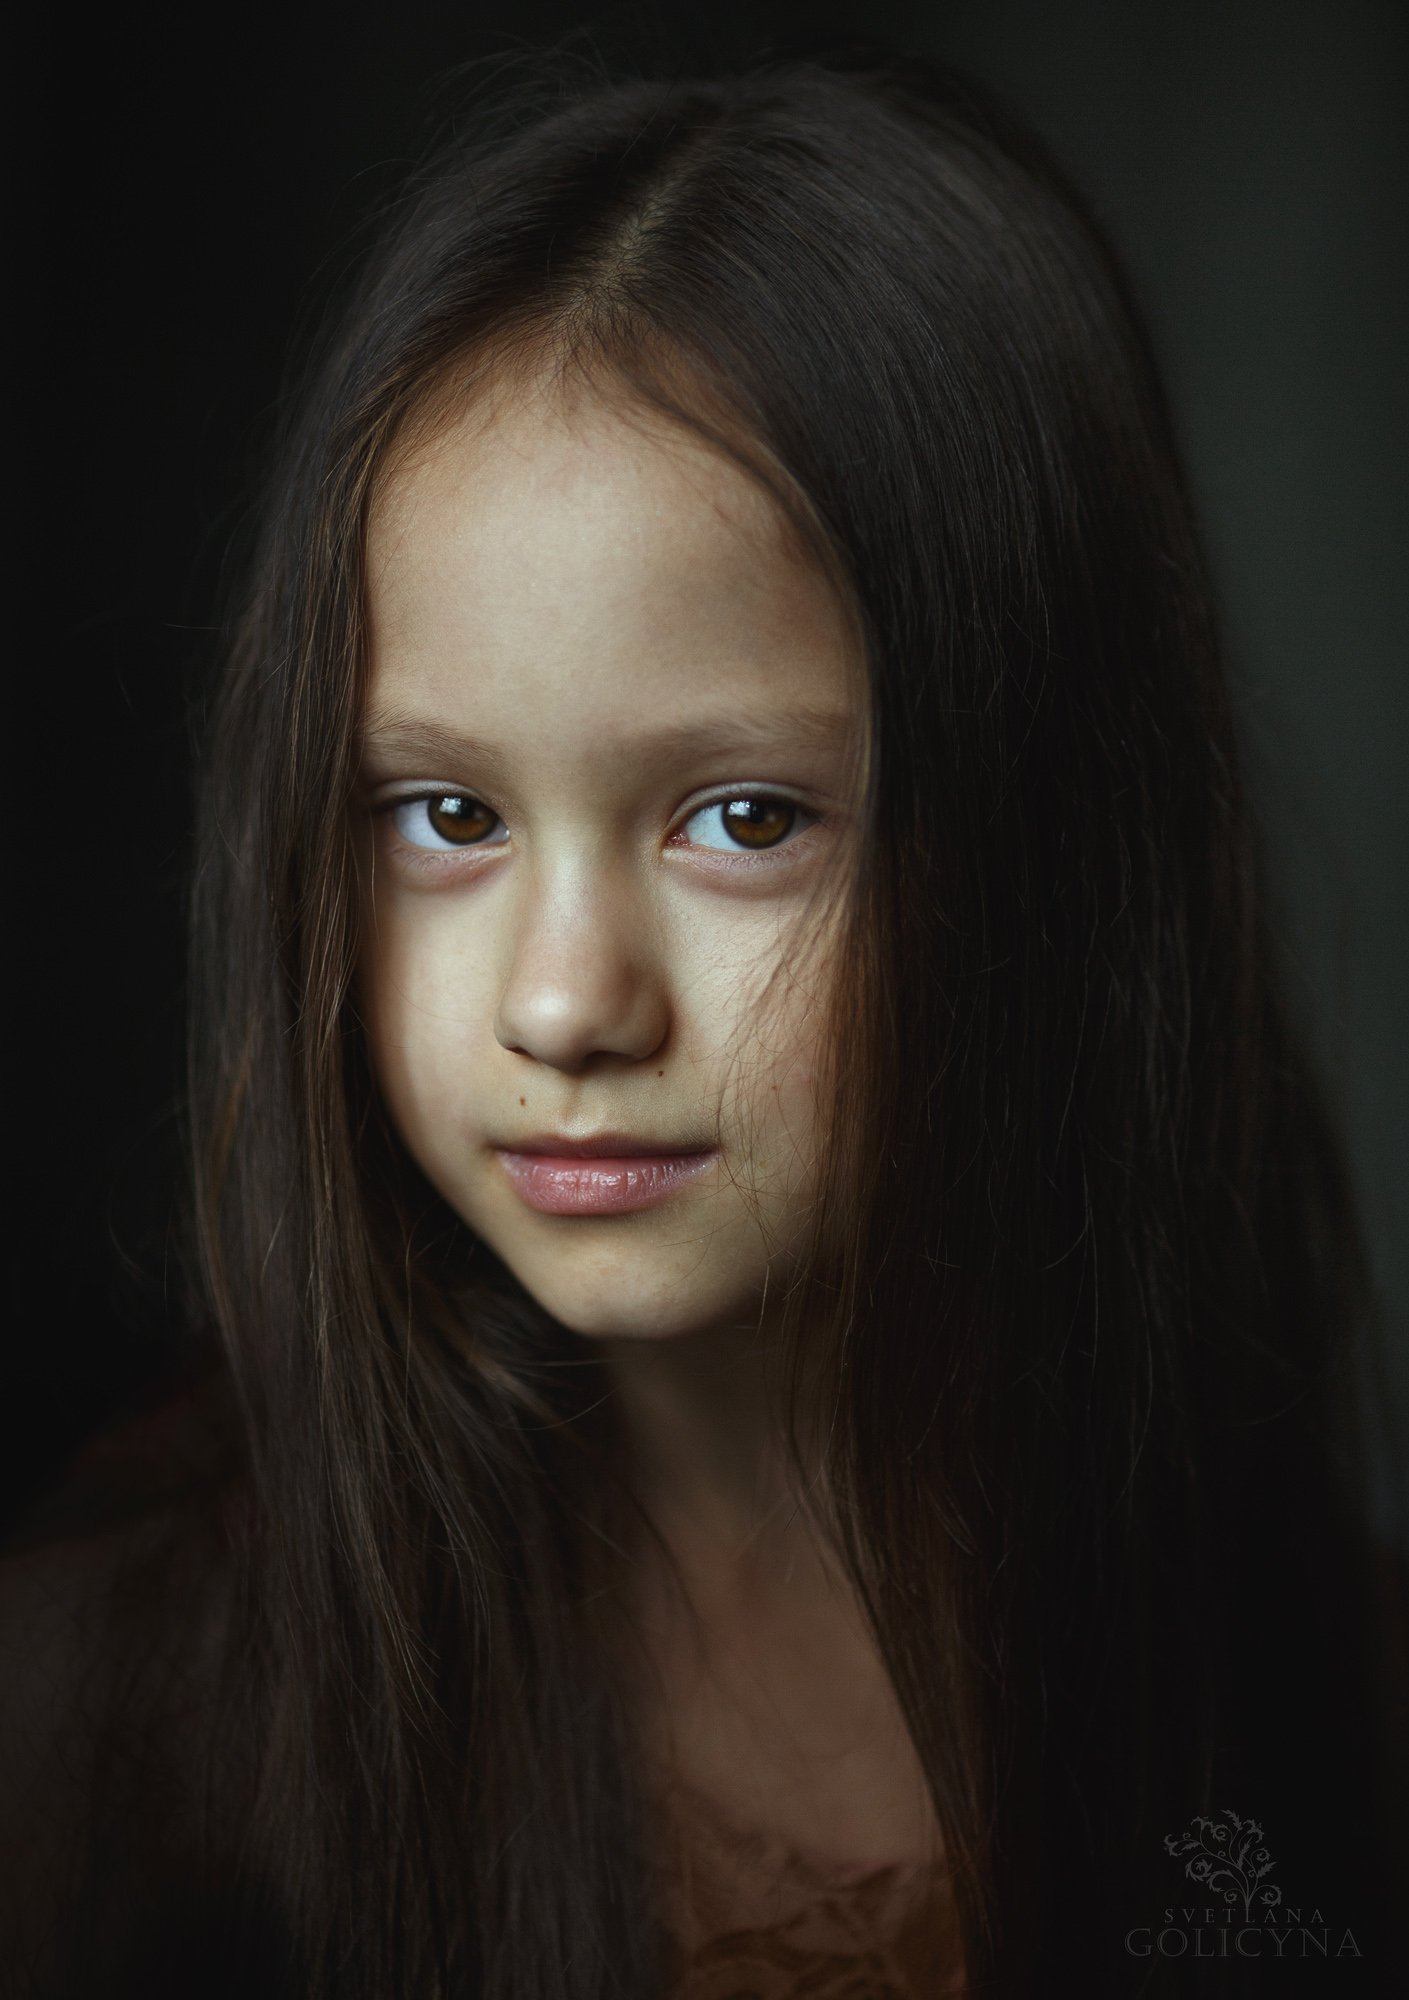 , Svetlana Golicyna